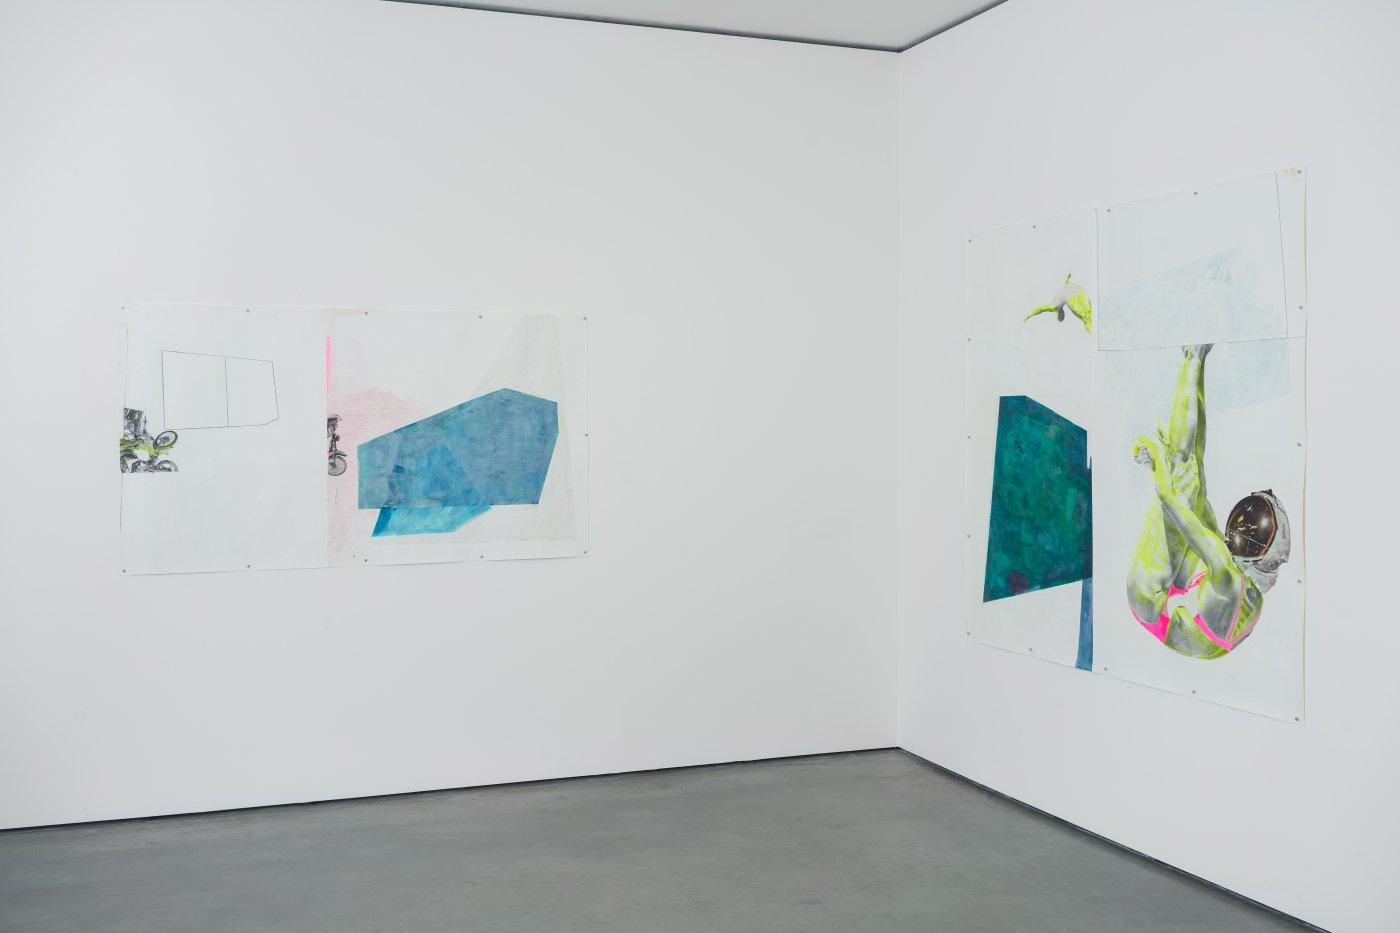 Goodman Gallery ruby onyinyechi amanze 3